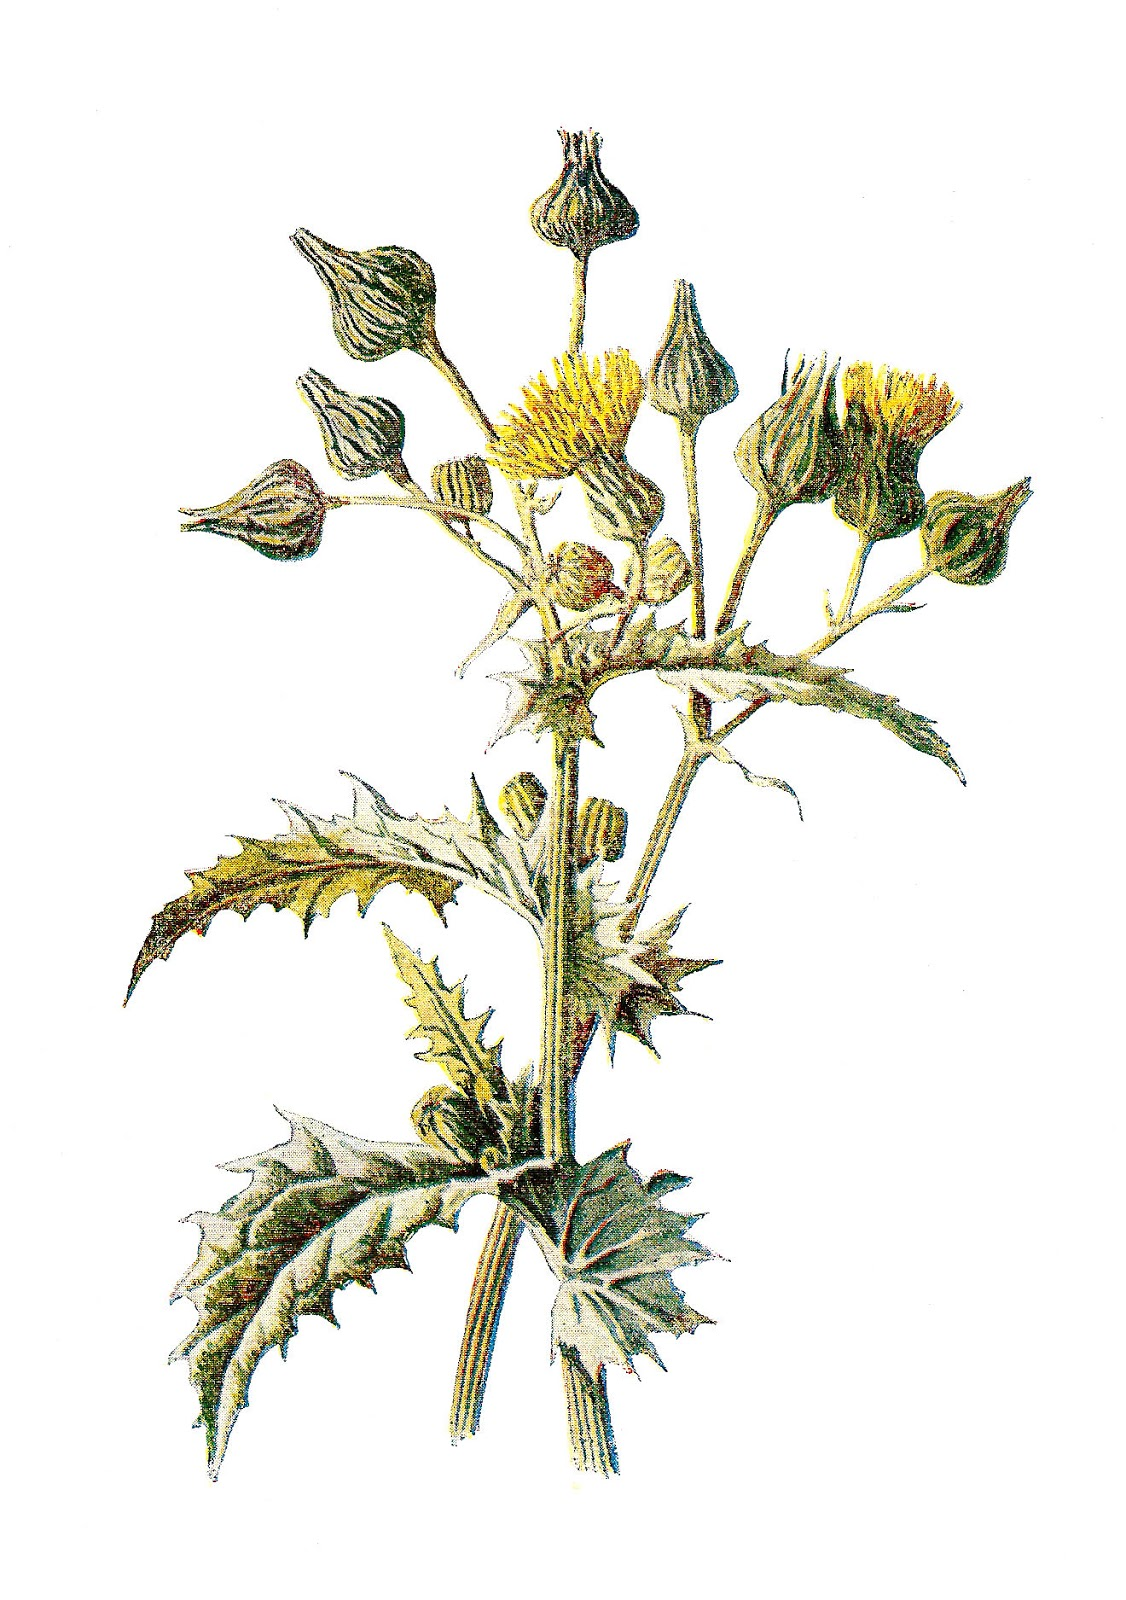 Antique Images: Digital Wildflower Image Sow Thistle Vintage.